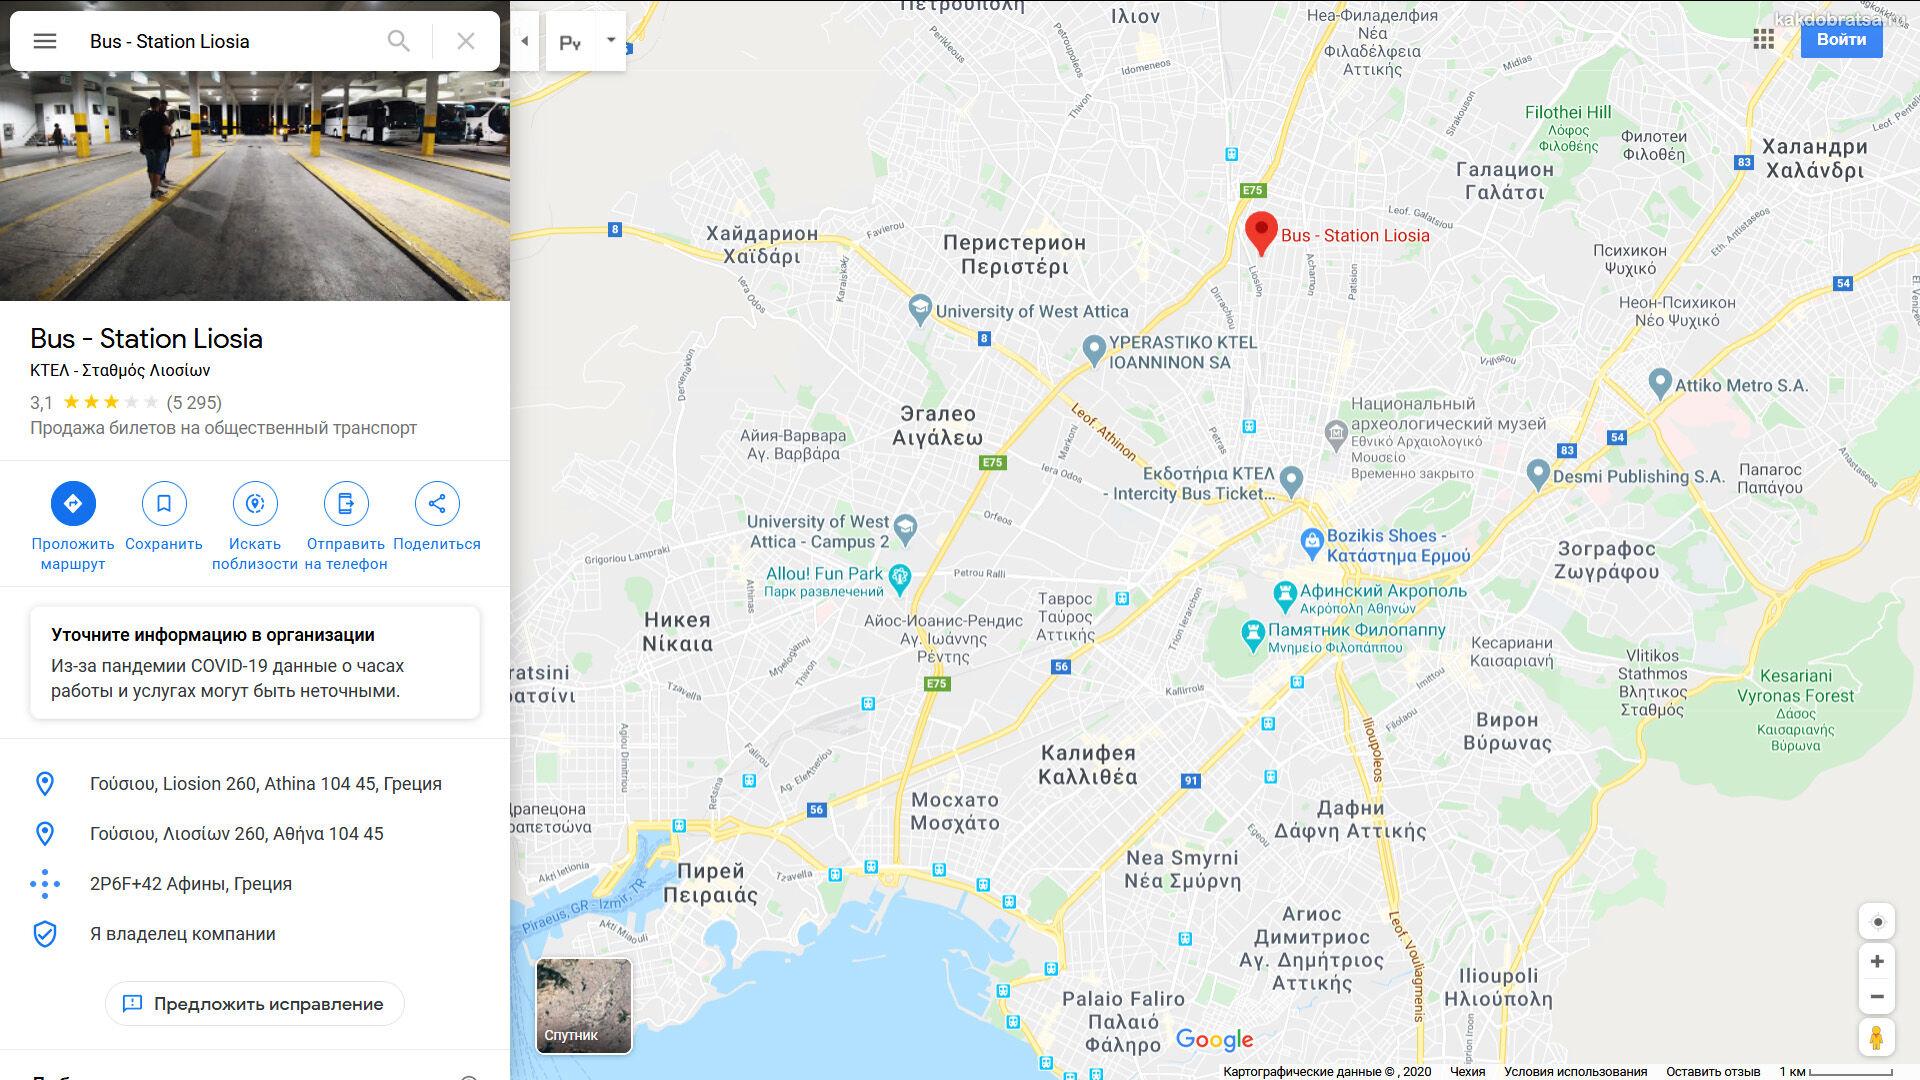 Автовокзал Афин Ктел Терминал В на карте и адрес